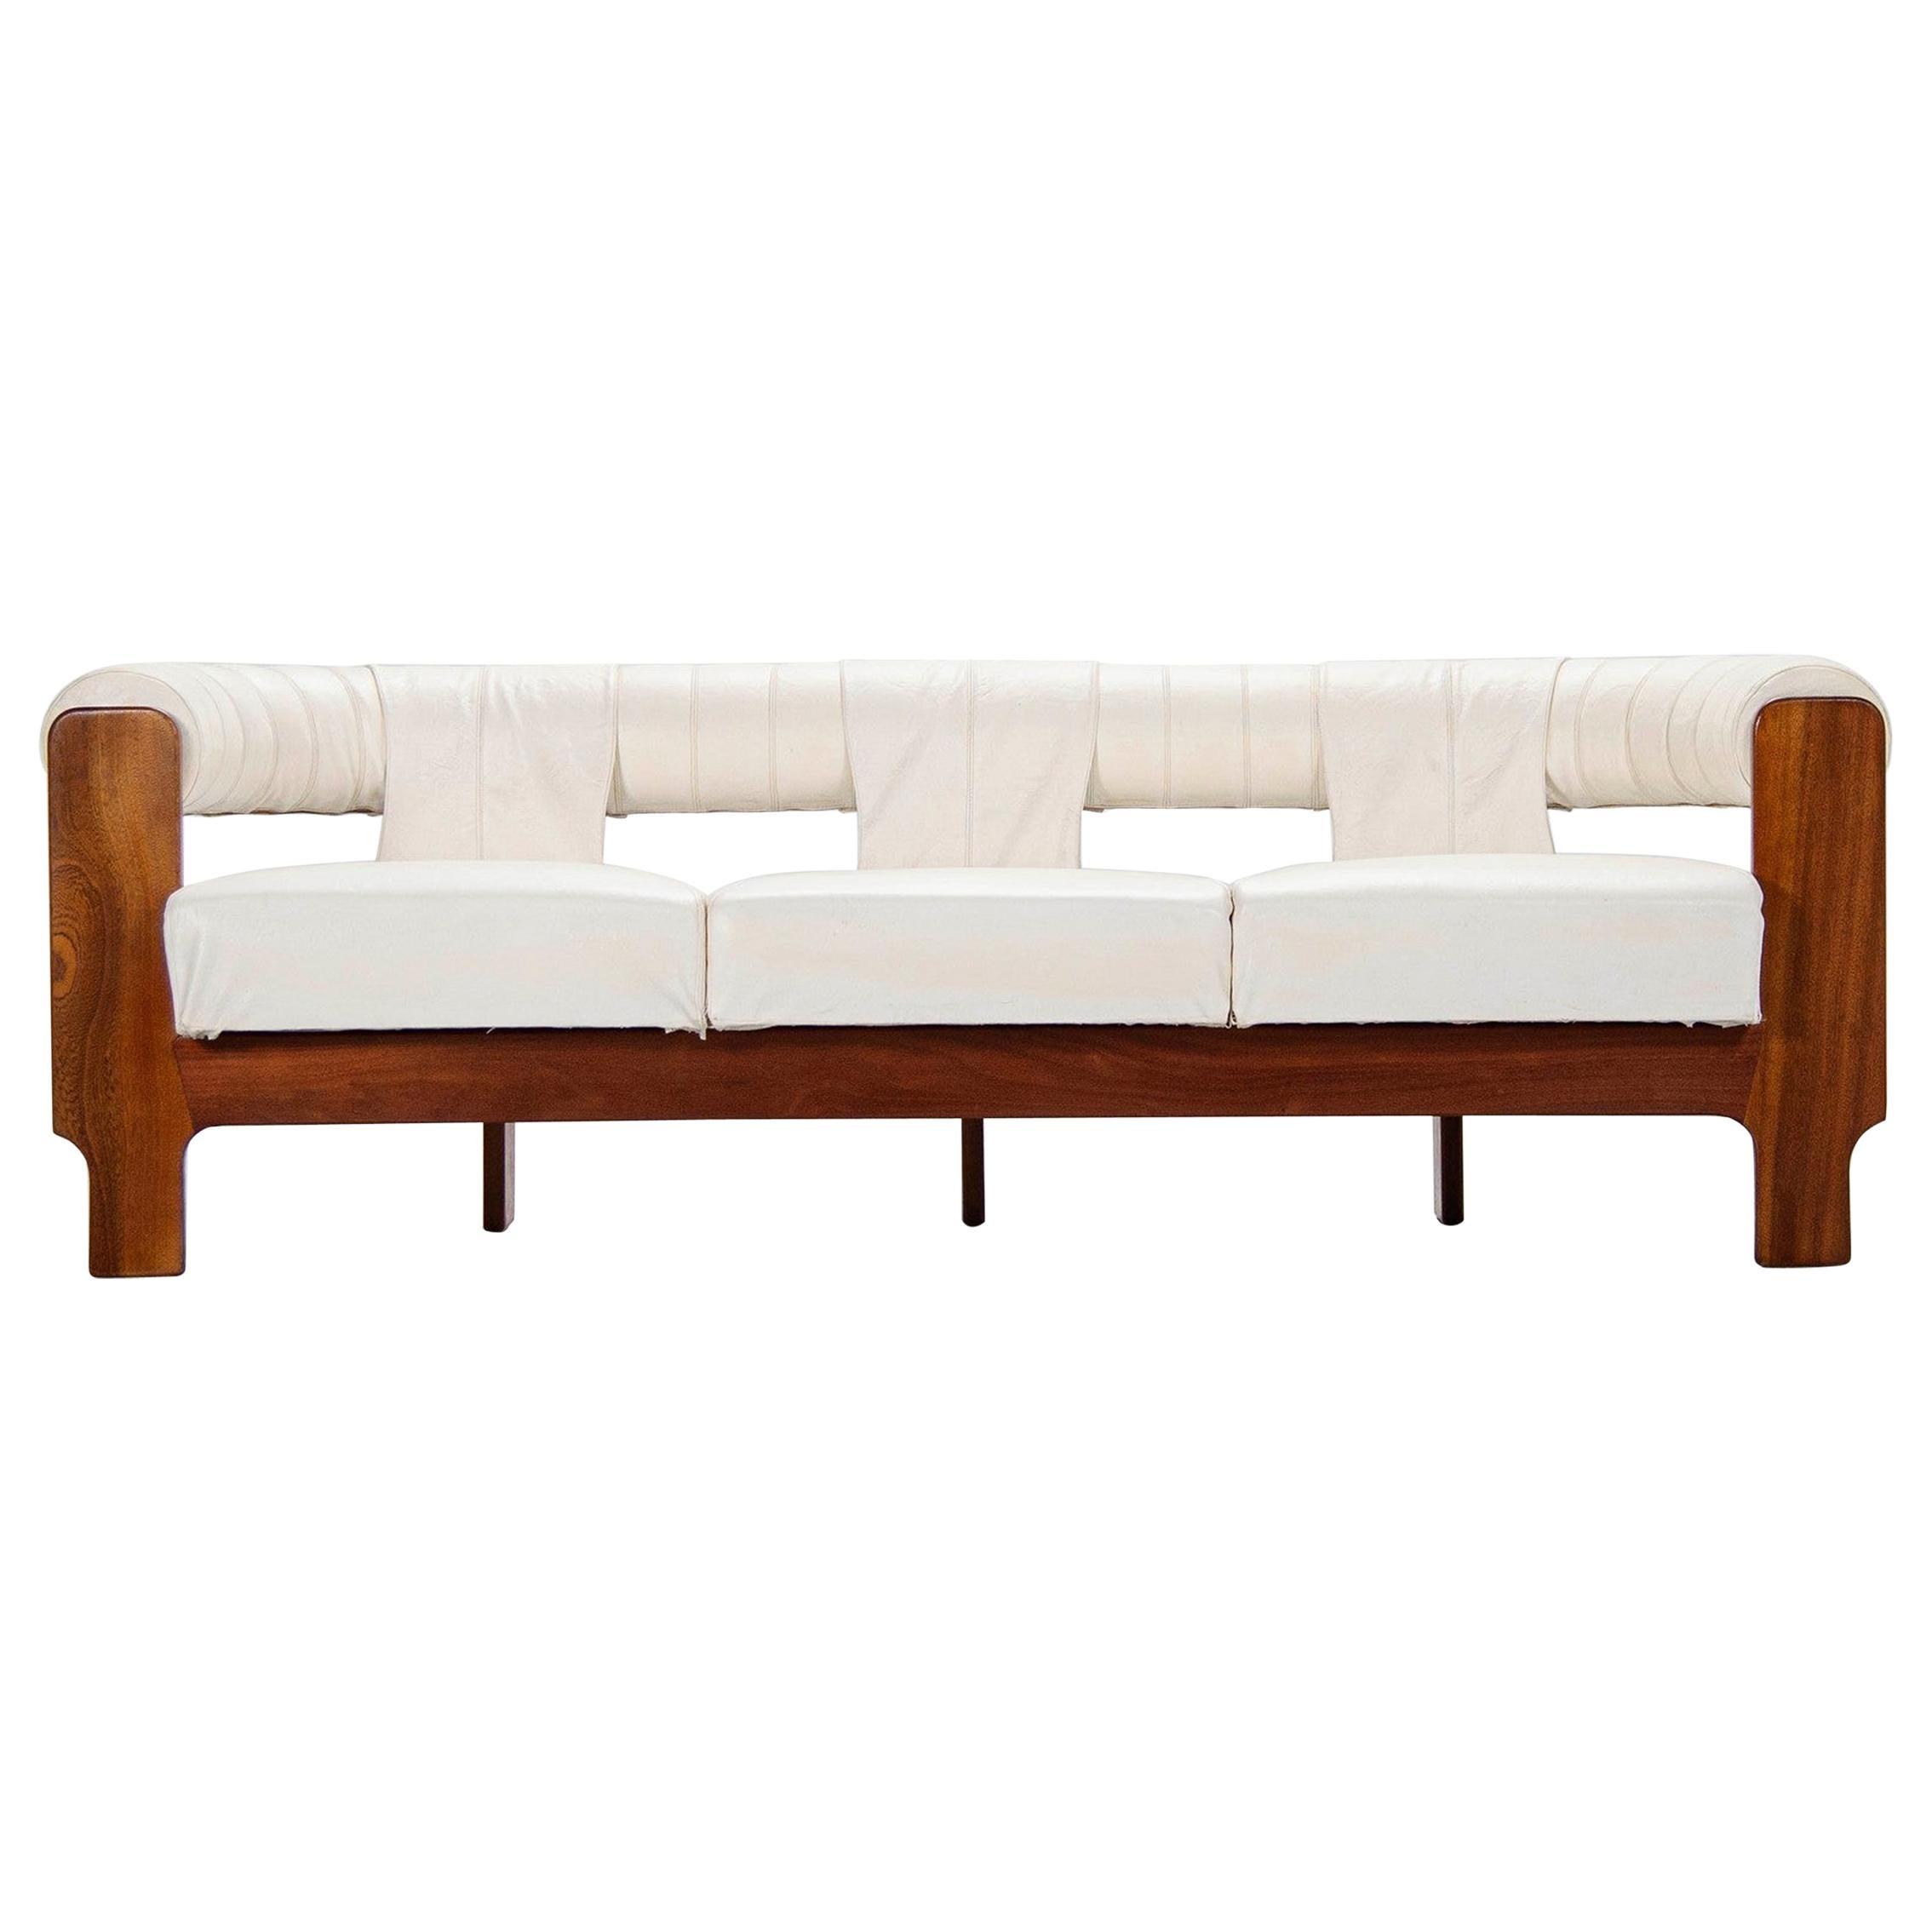 Spanish Lounge Sofa in Teak and White Leatherette, 1970